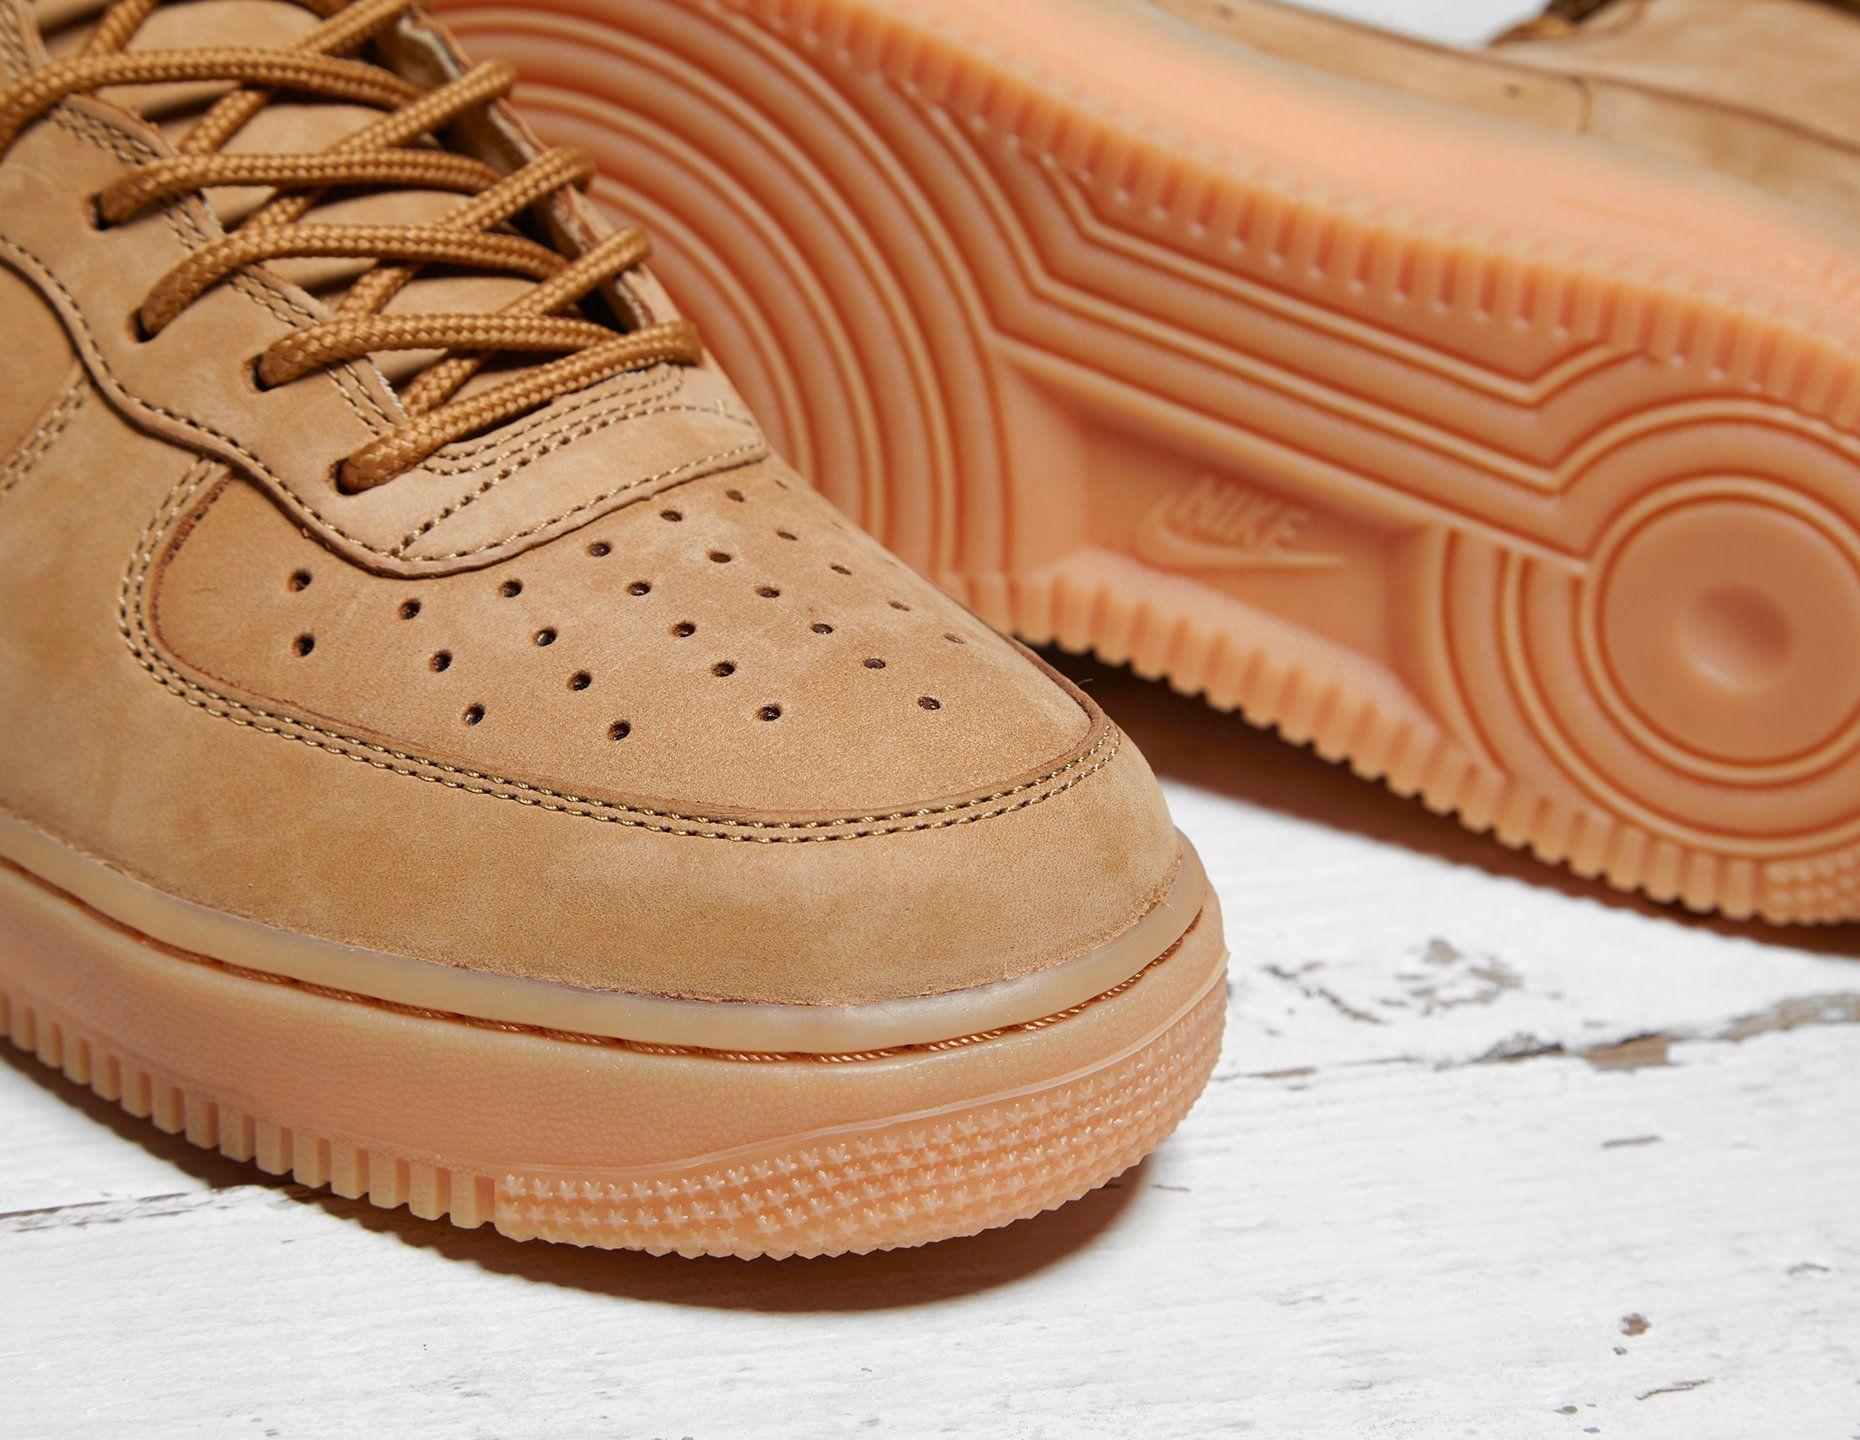 Nike Air Force 1 High LV8